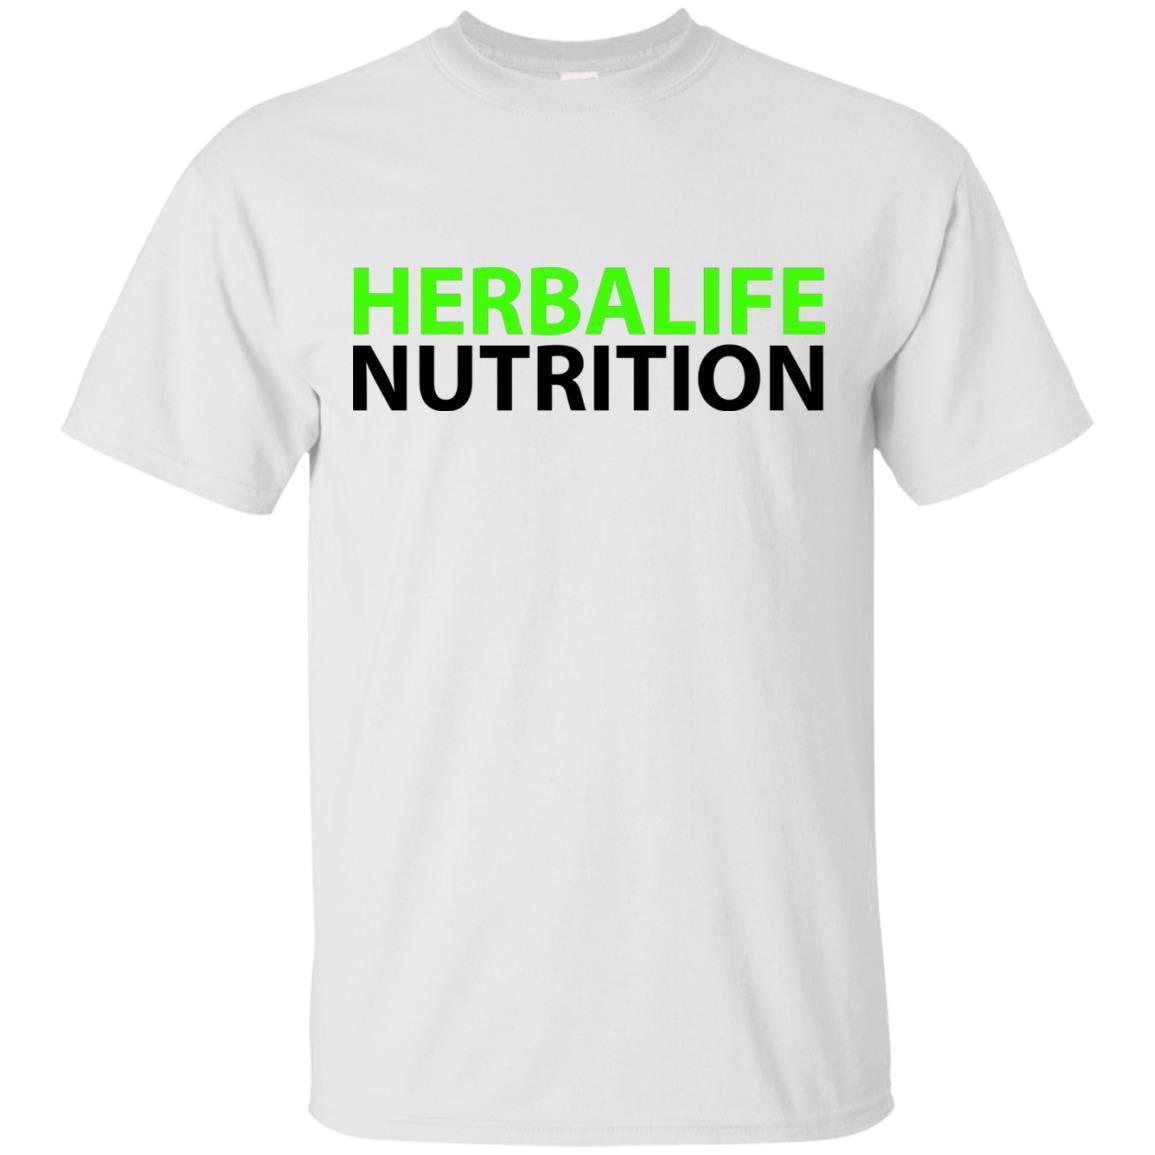 HERBALIFE NUTRITION T-Shirt – Black Design